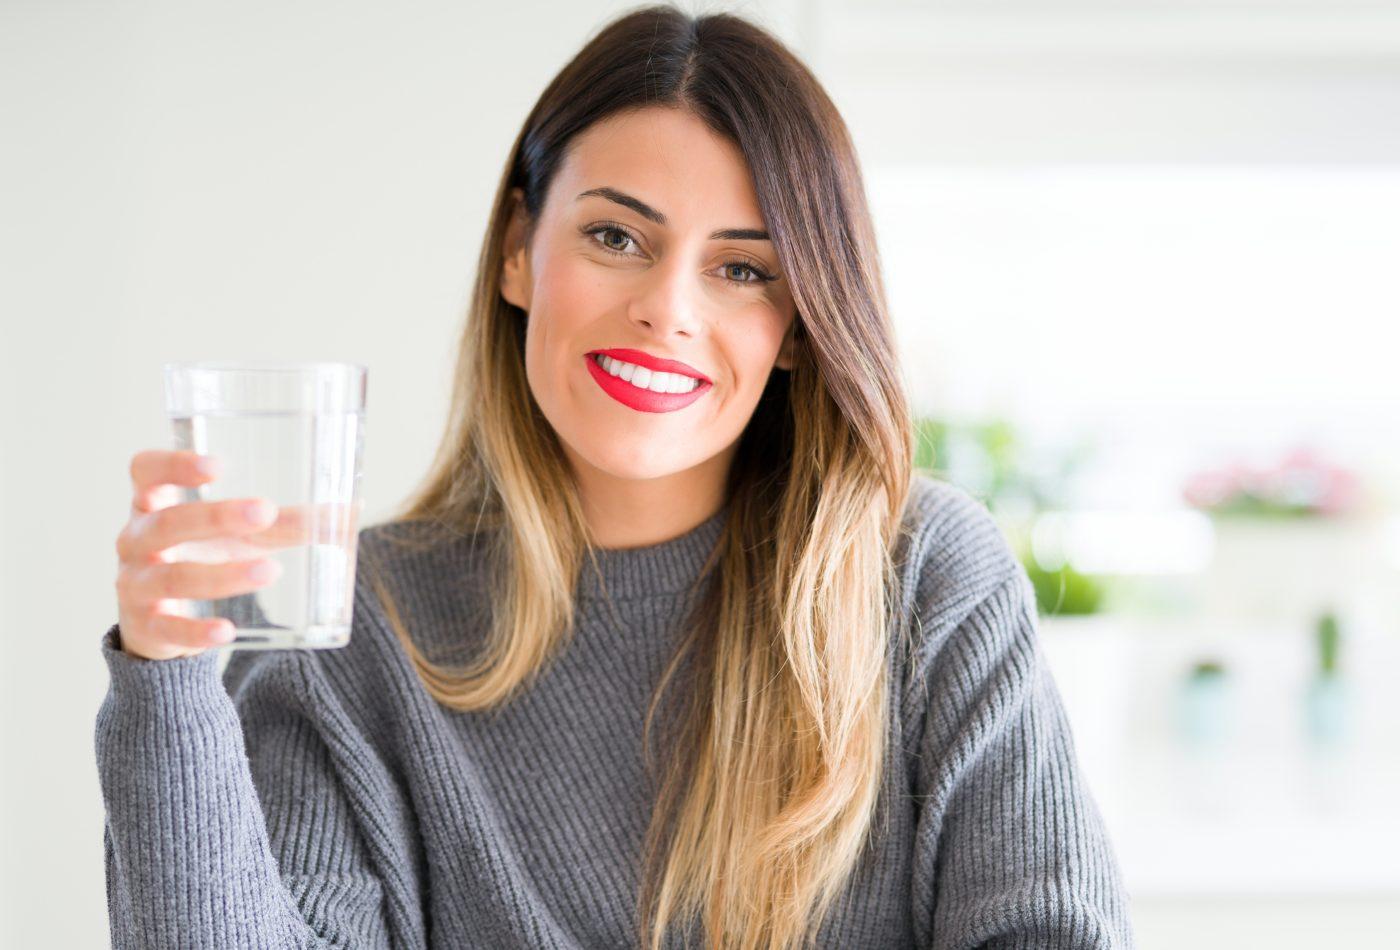 Mulher a beber copo de água